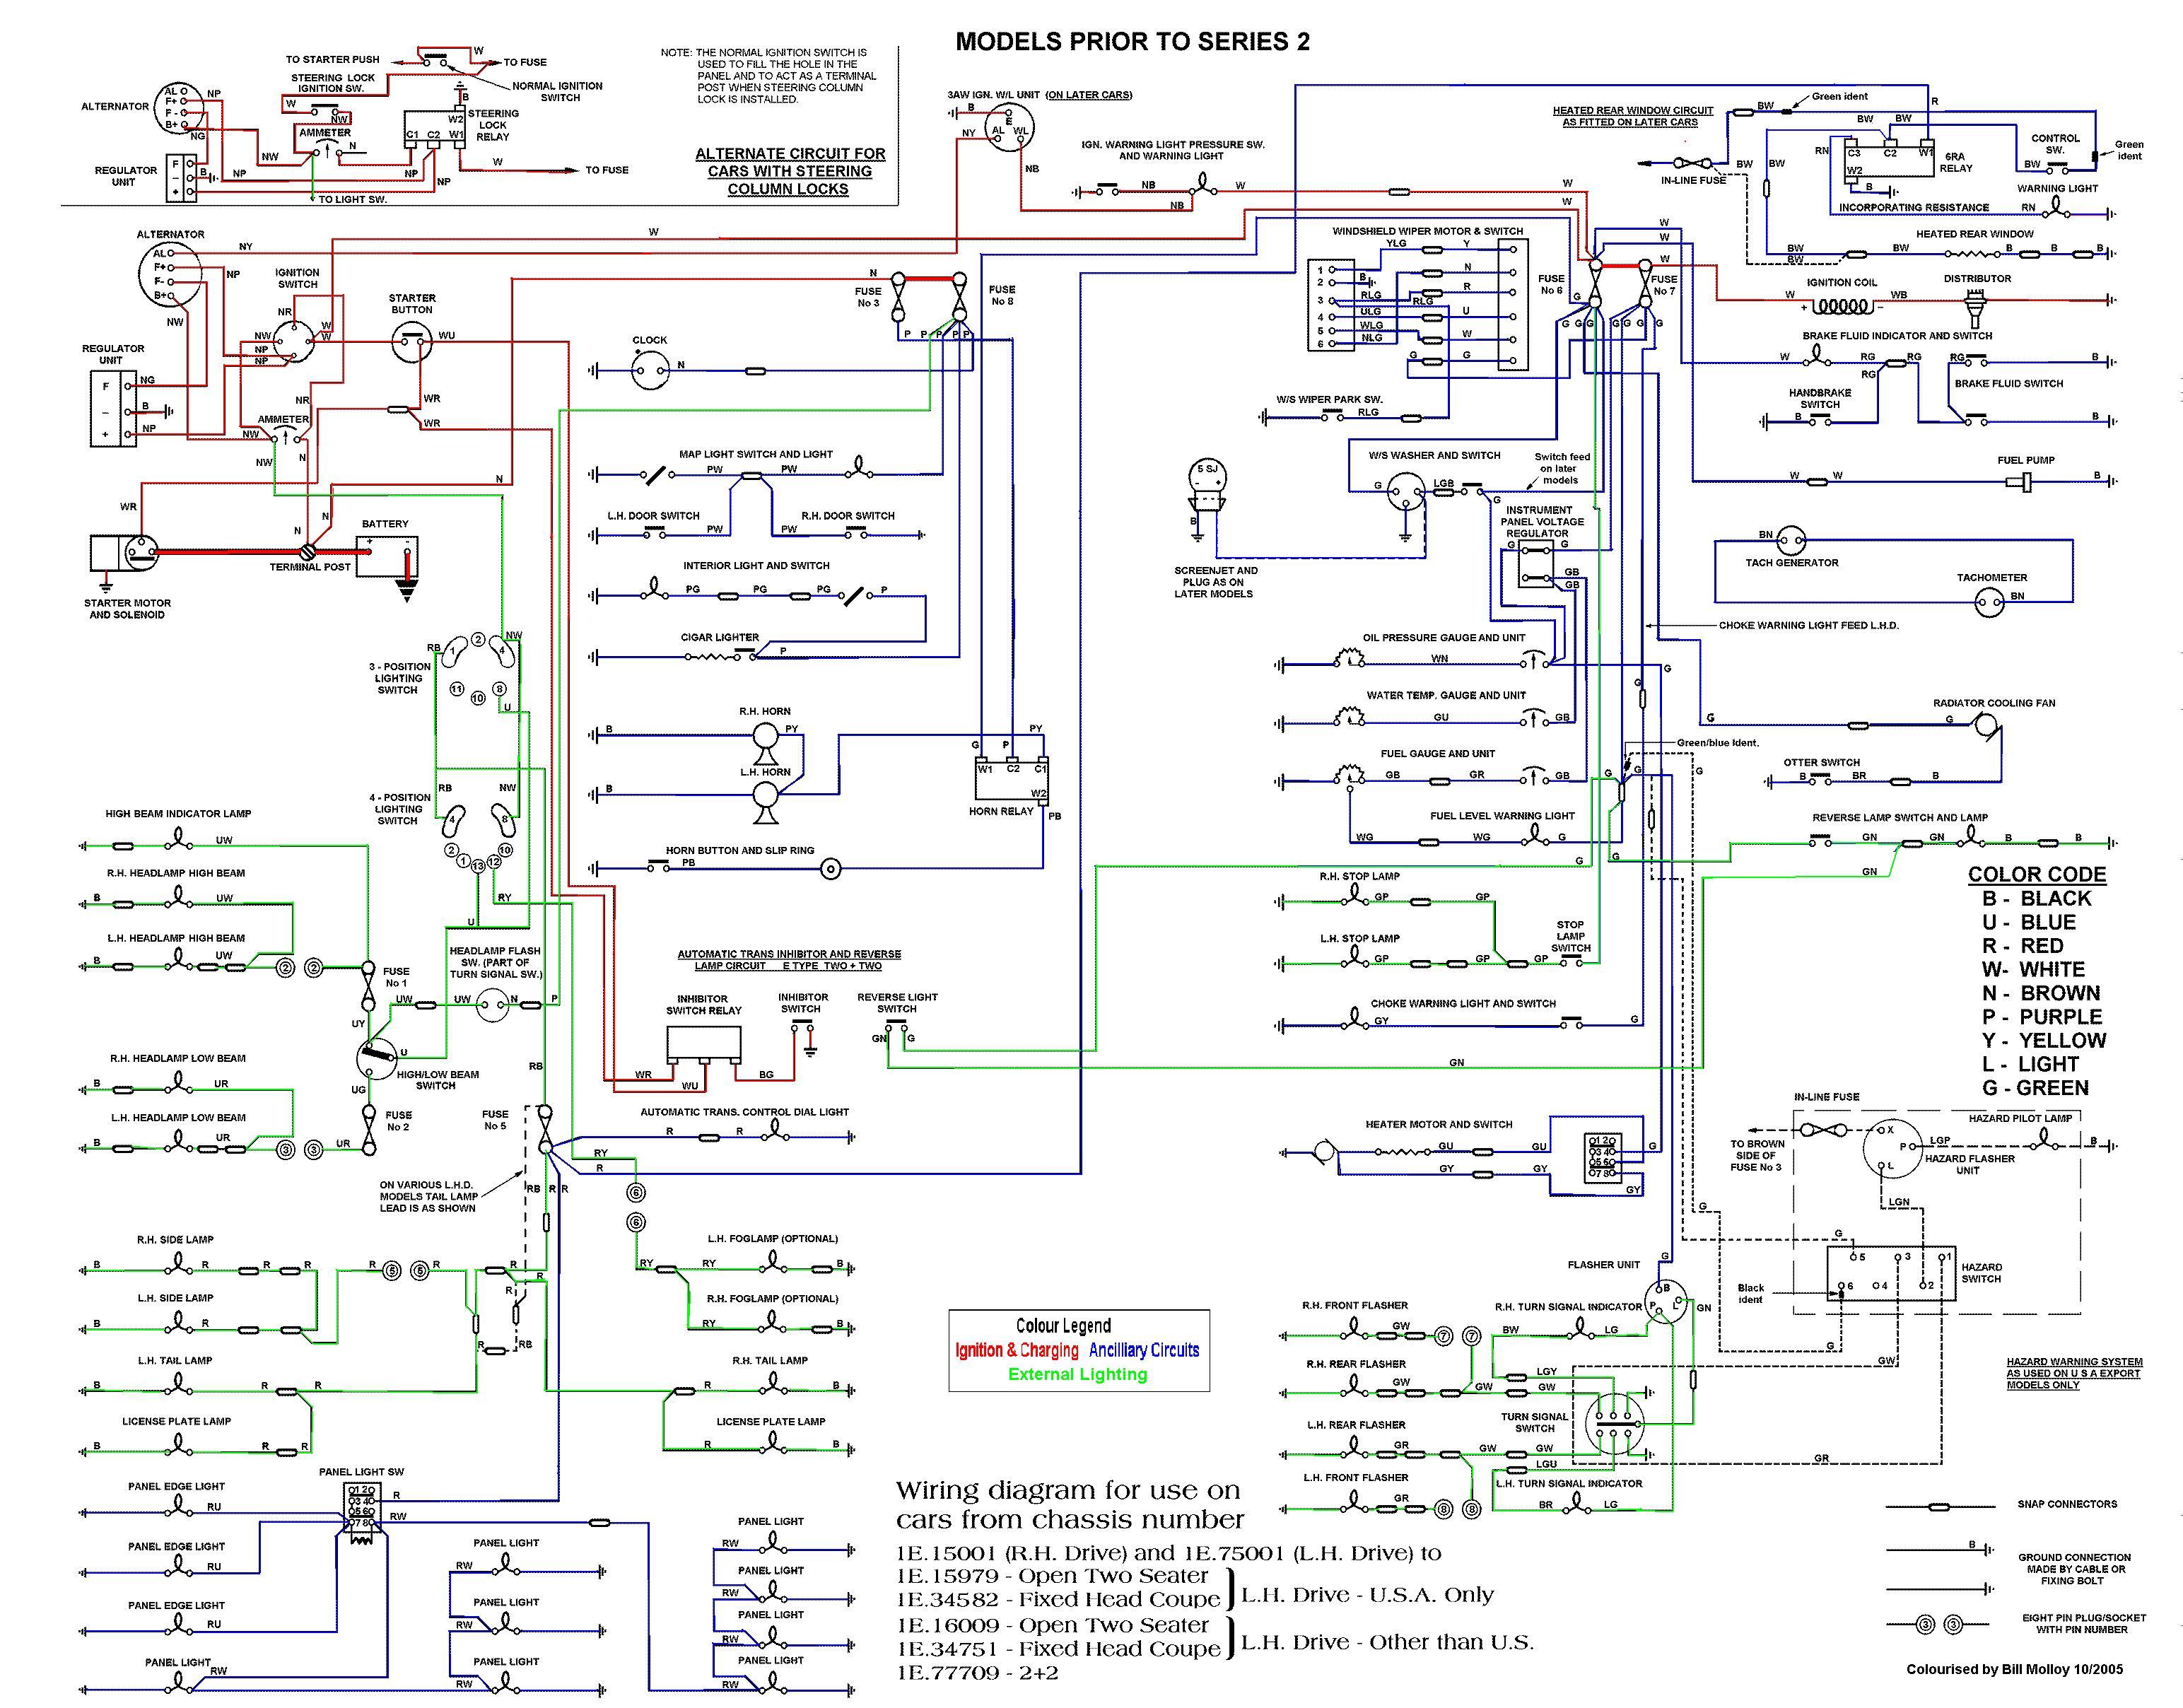 94 integra cruise control wiring diagram d90 acura integra headlight wiring diagram wiring resources  d90 acura integra headlight wiring